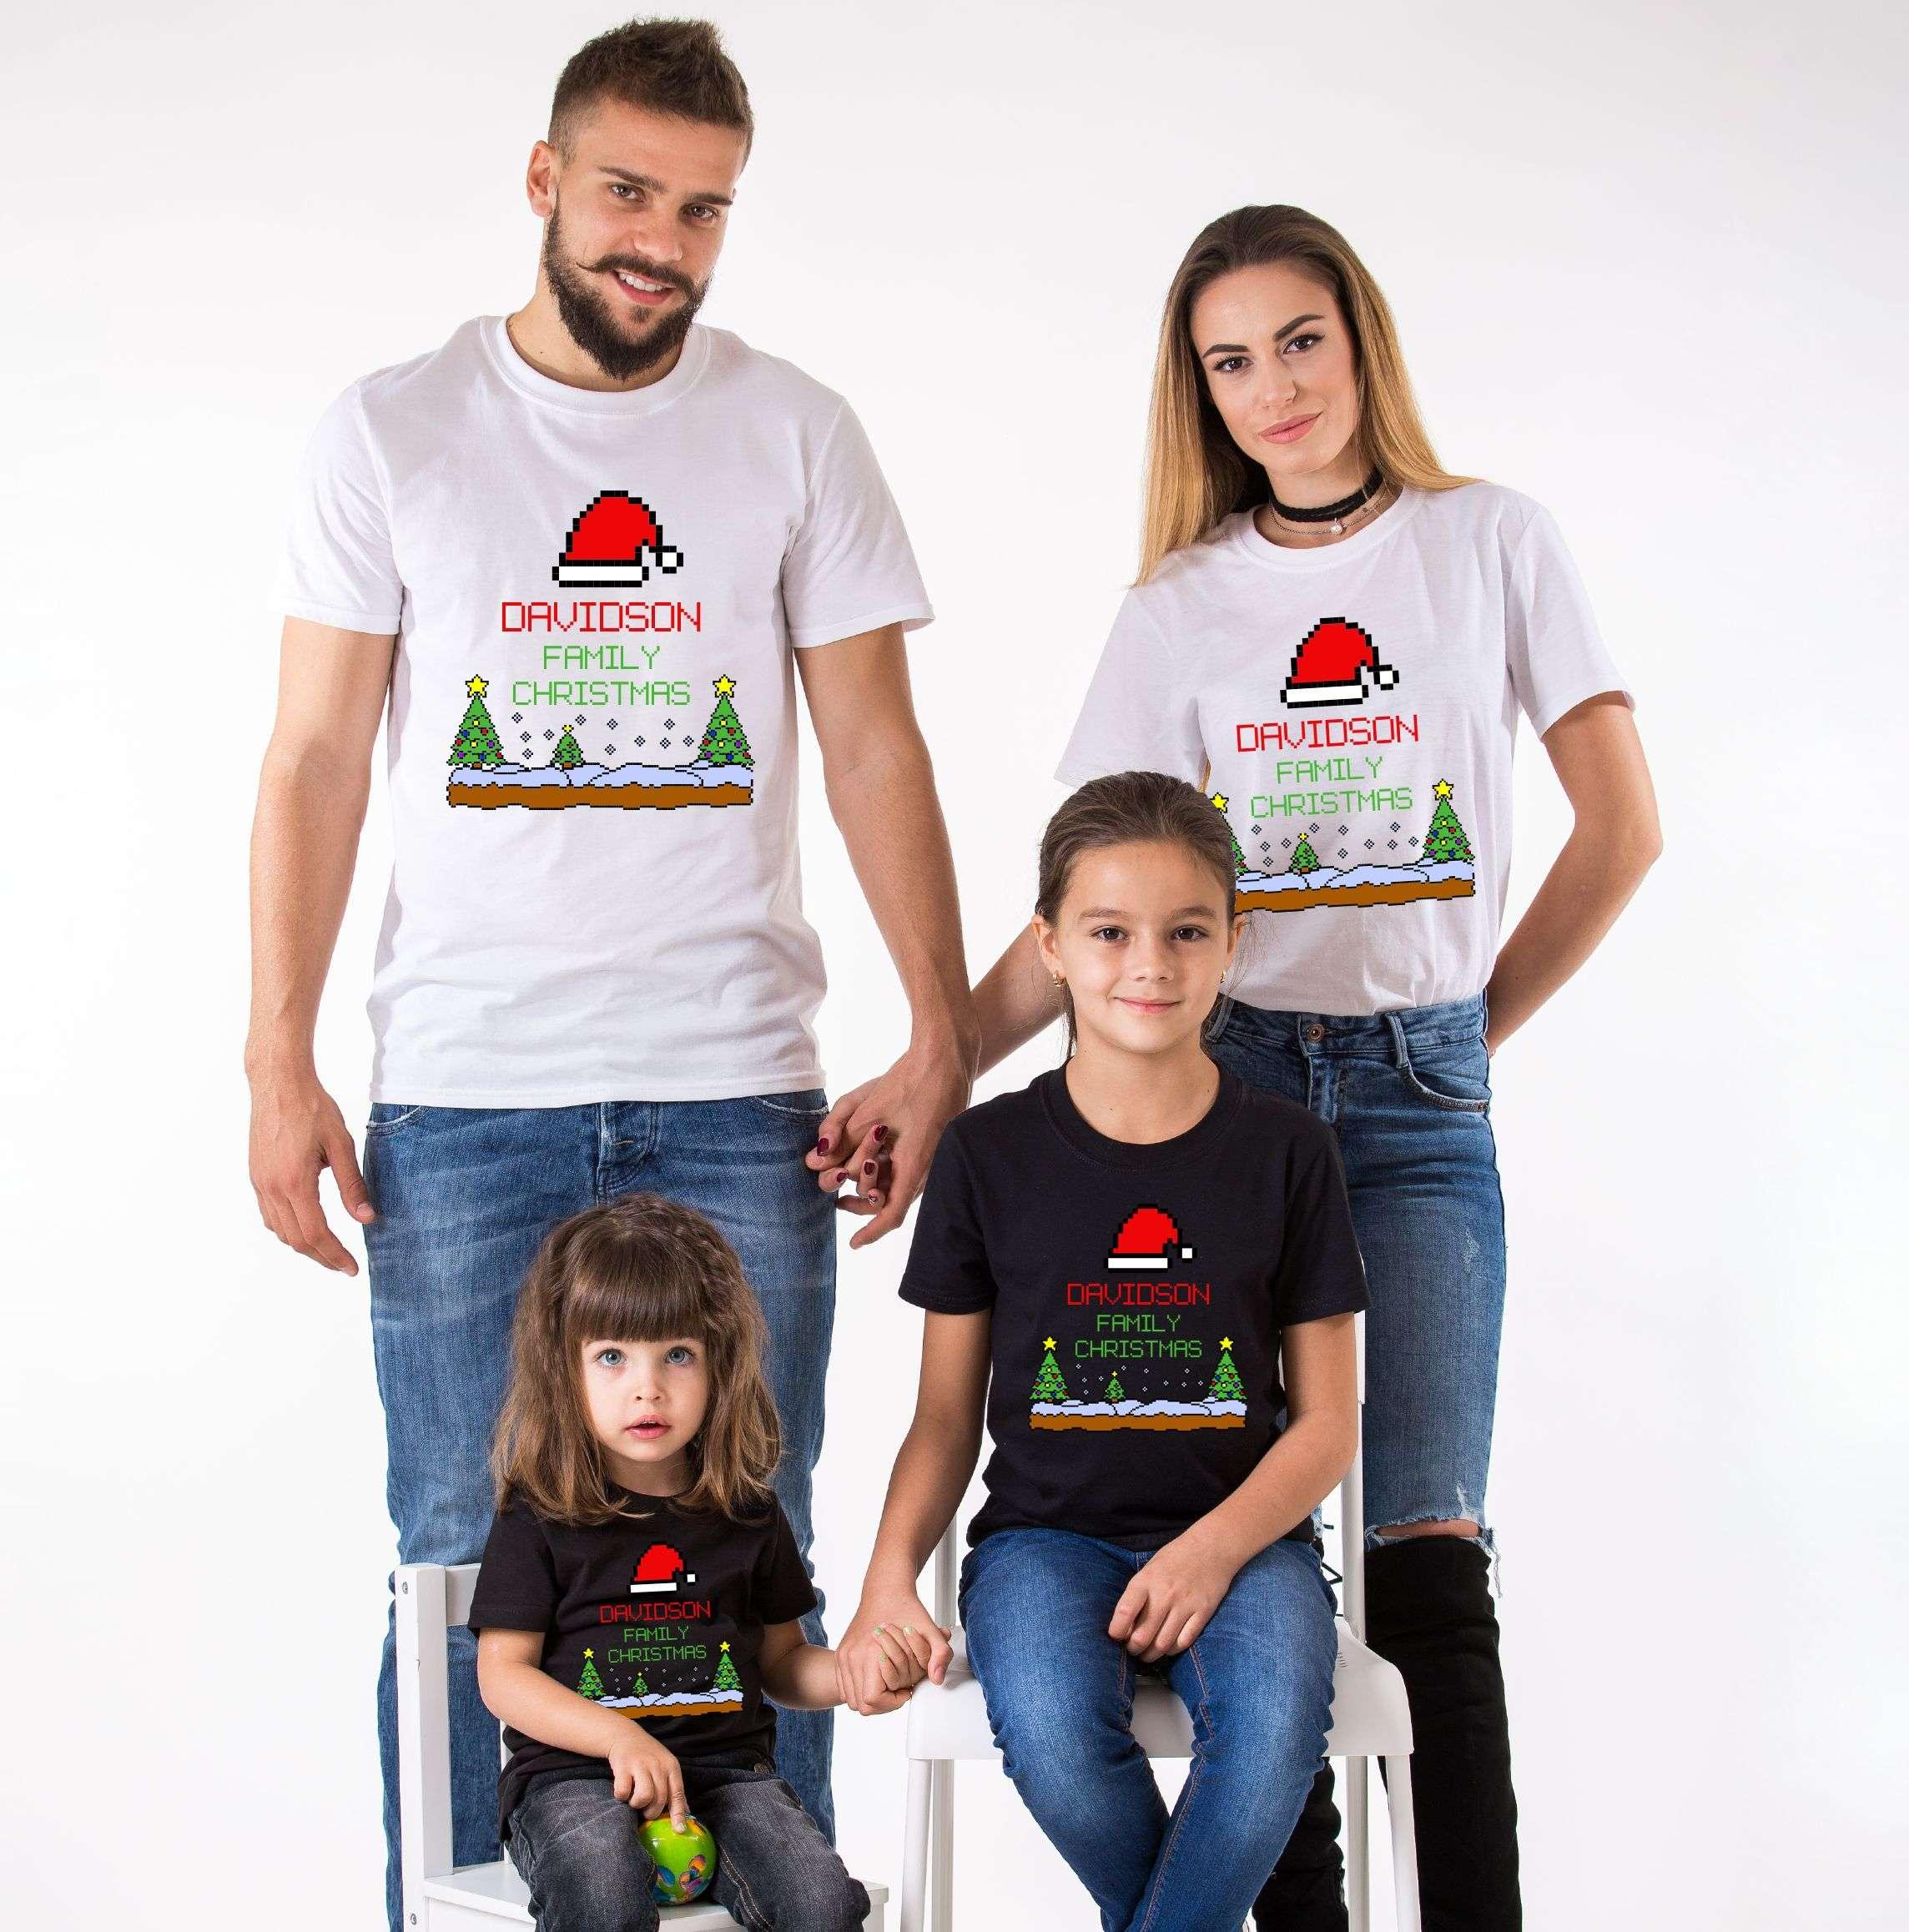 Matching Family Christmas Outfits Australia.Matching Christmas Shirts Australia Toffee Art